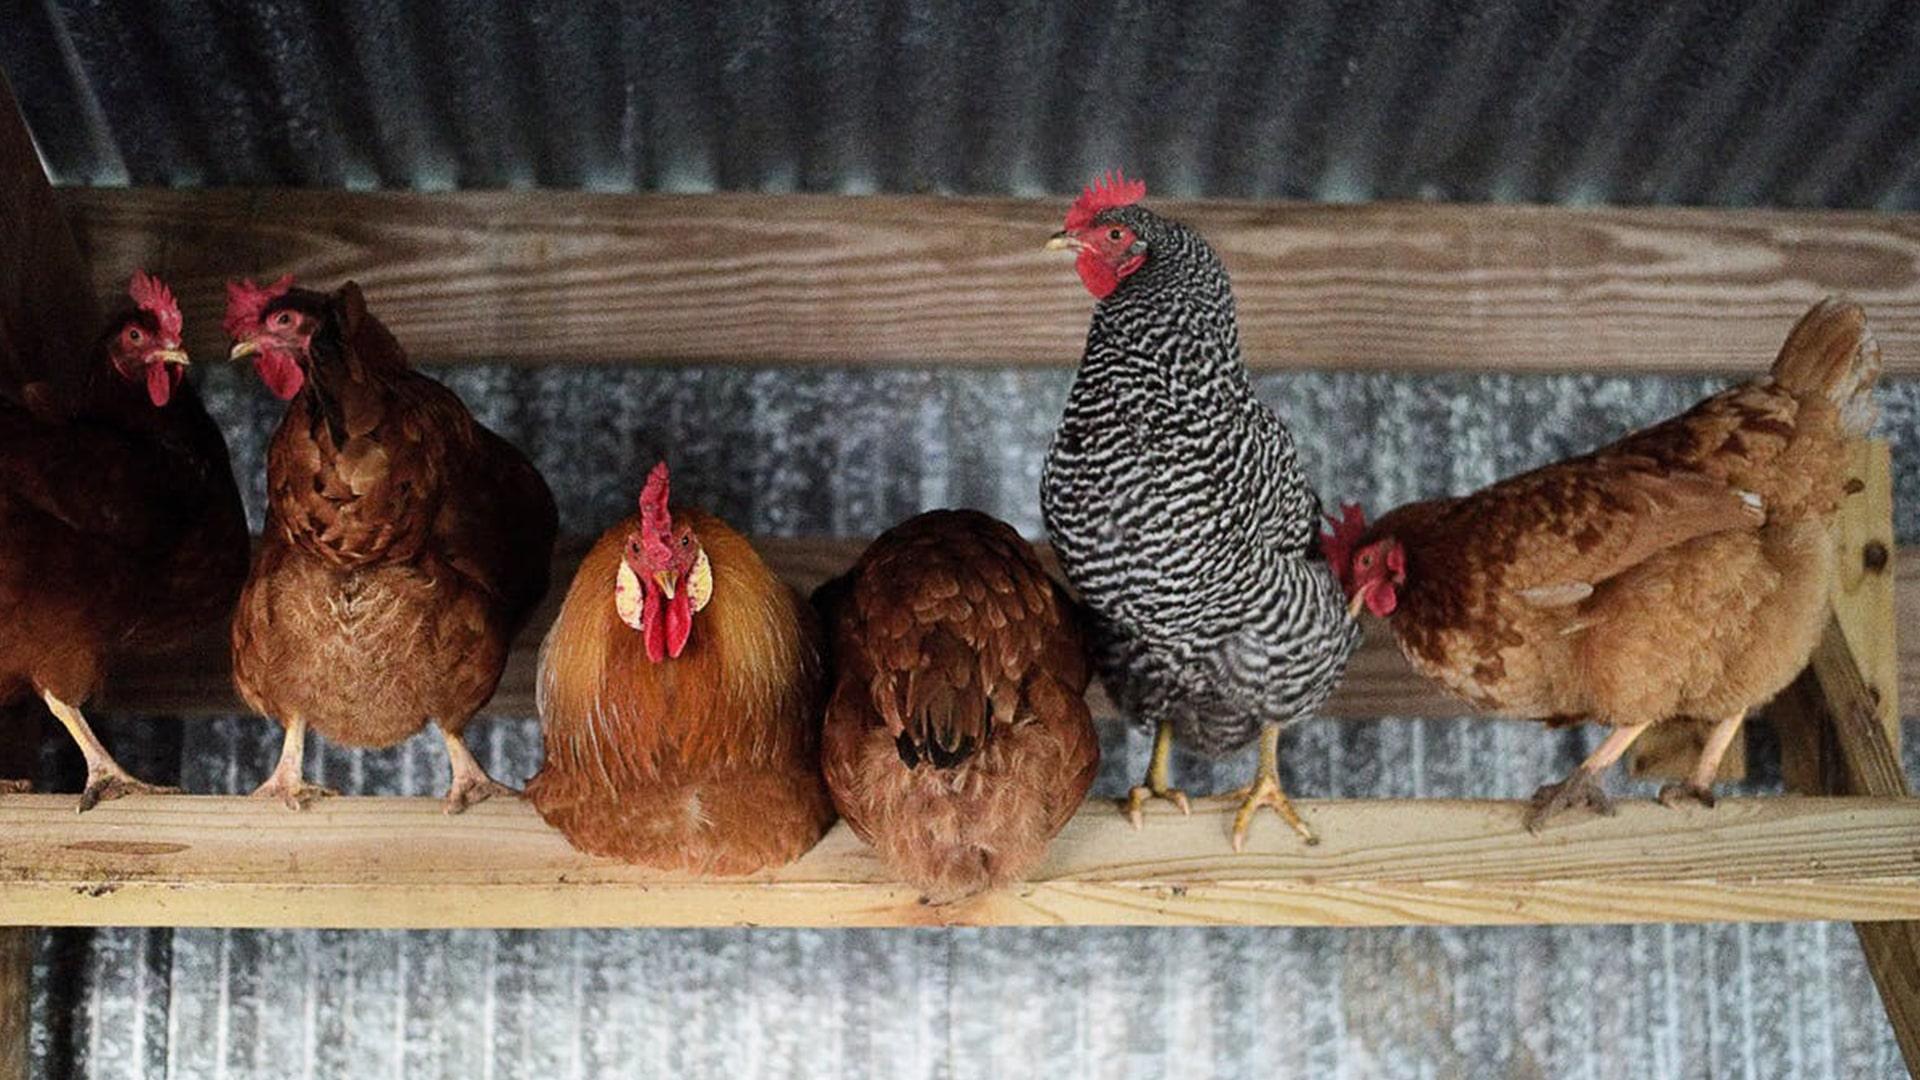 Harvesting Chickens